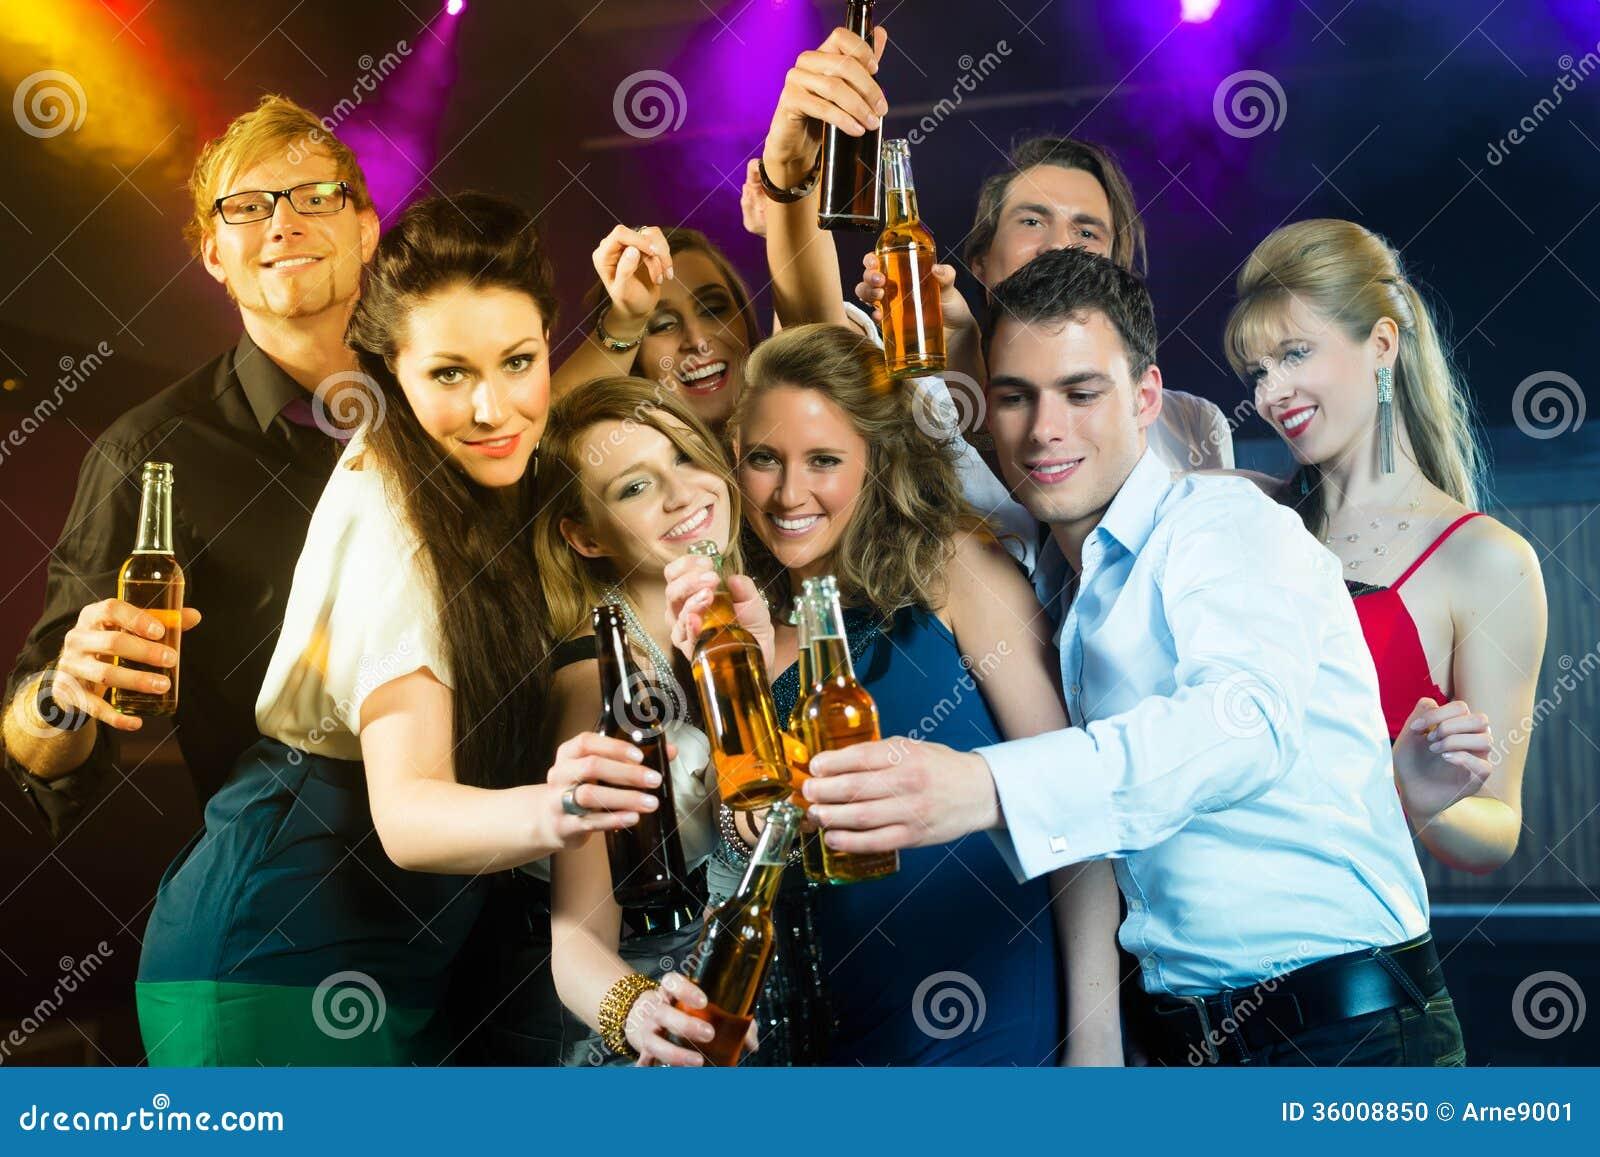 Vendor: vectortoon Type: Clipart Price: 20.00 Source ...  |People Having Fun In A Club